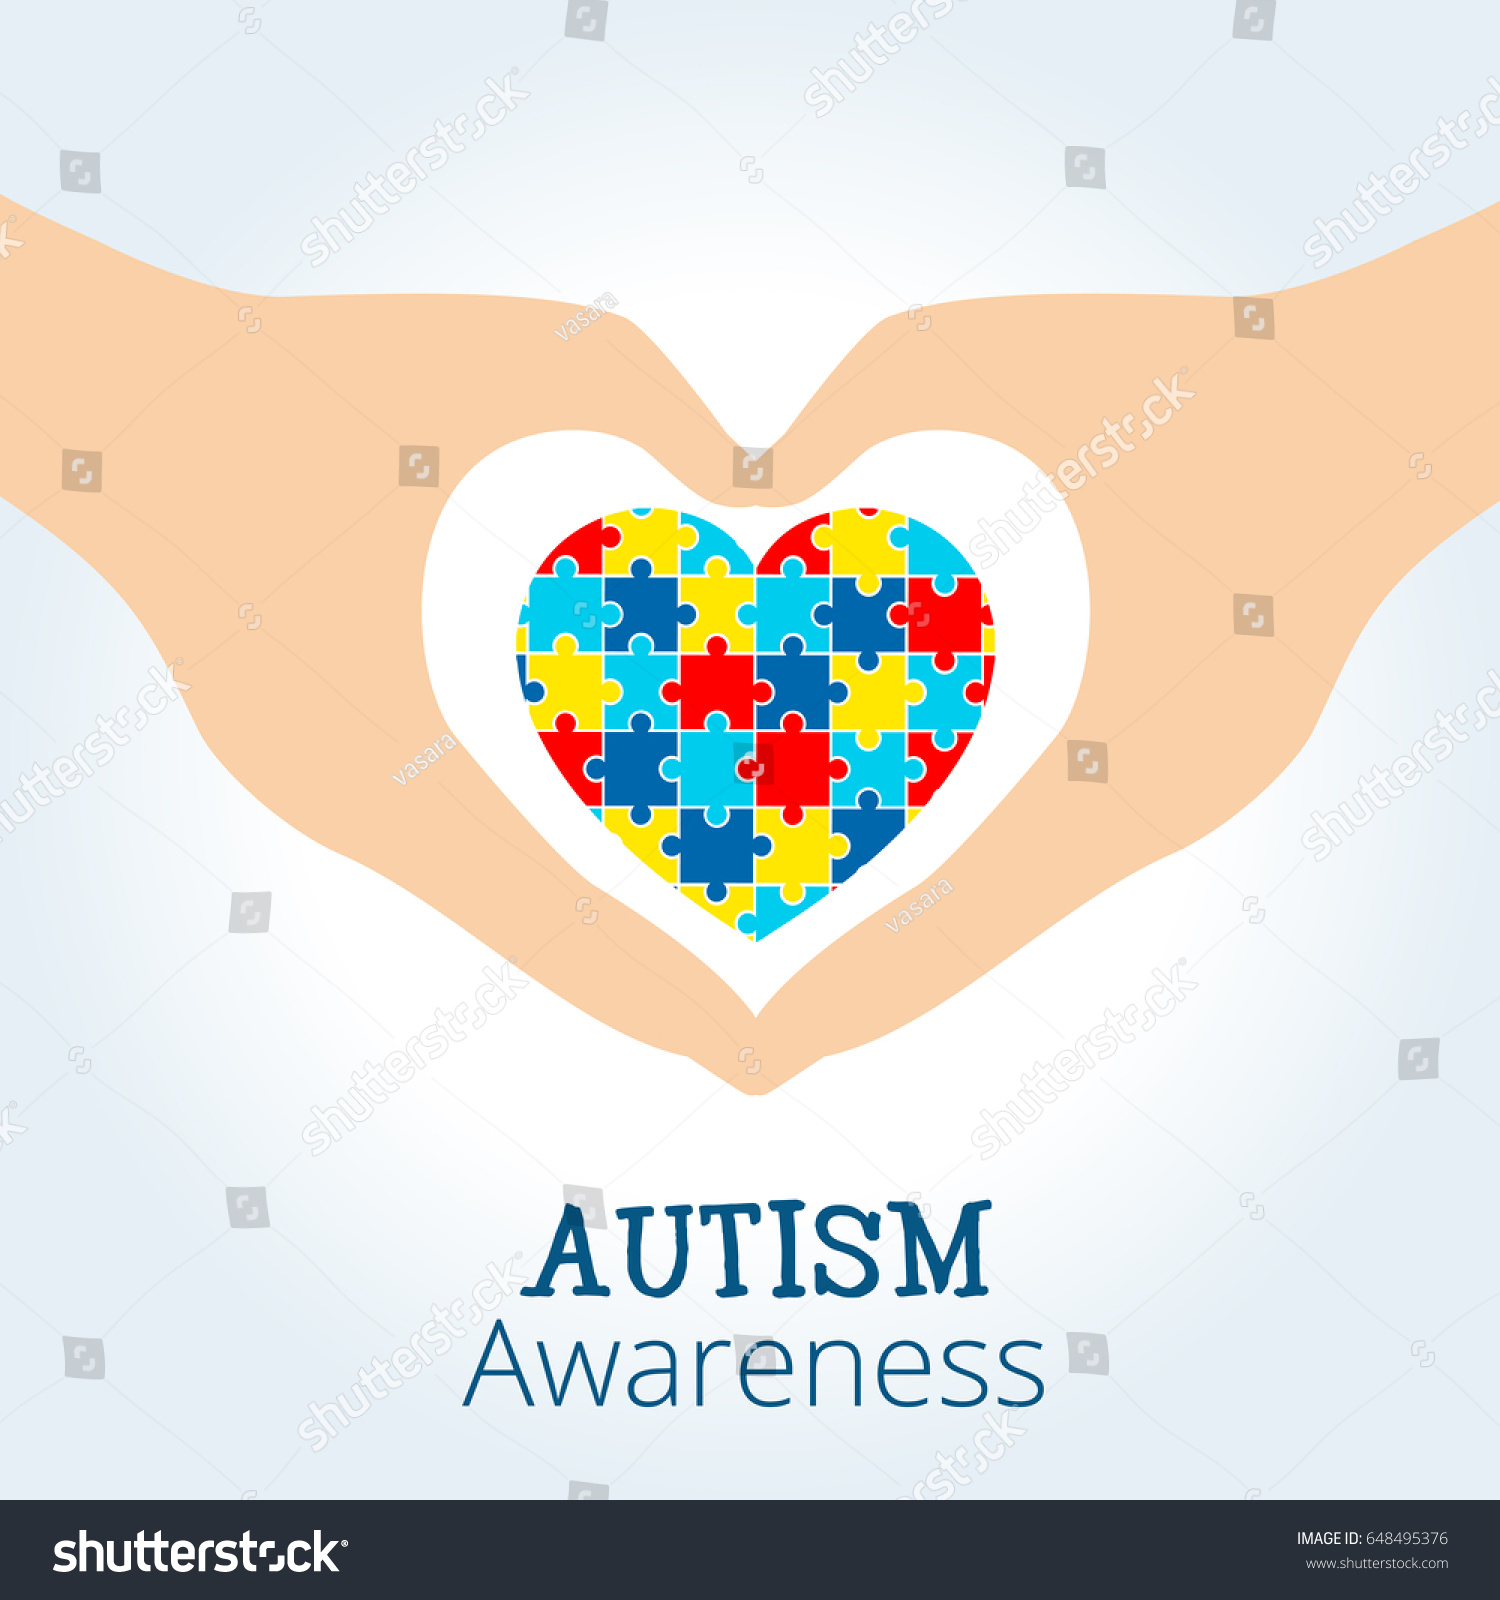 autism awareness concept heart puzzle pieces stock vector